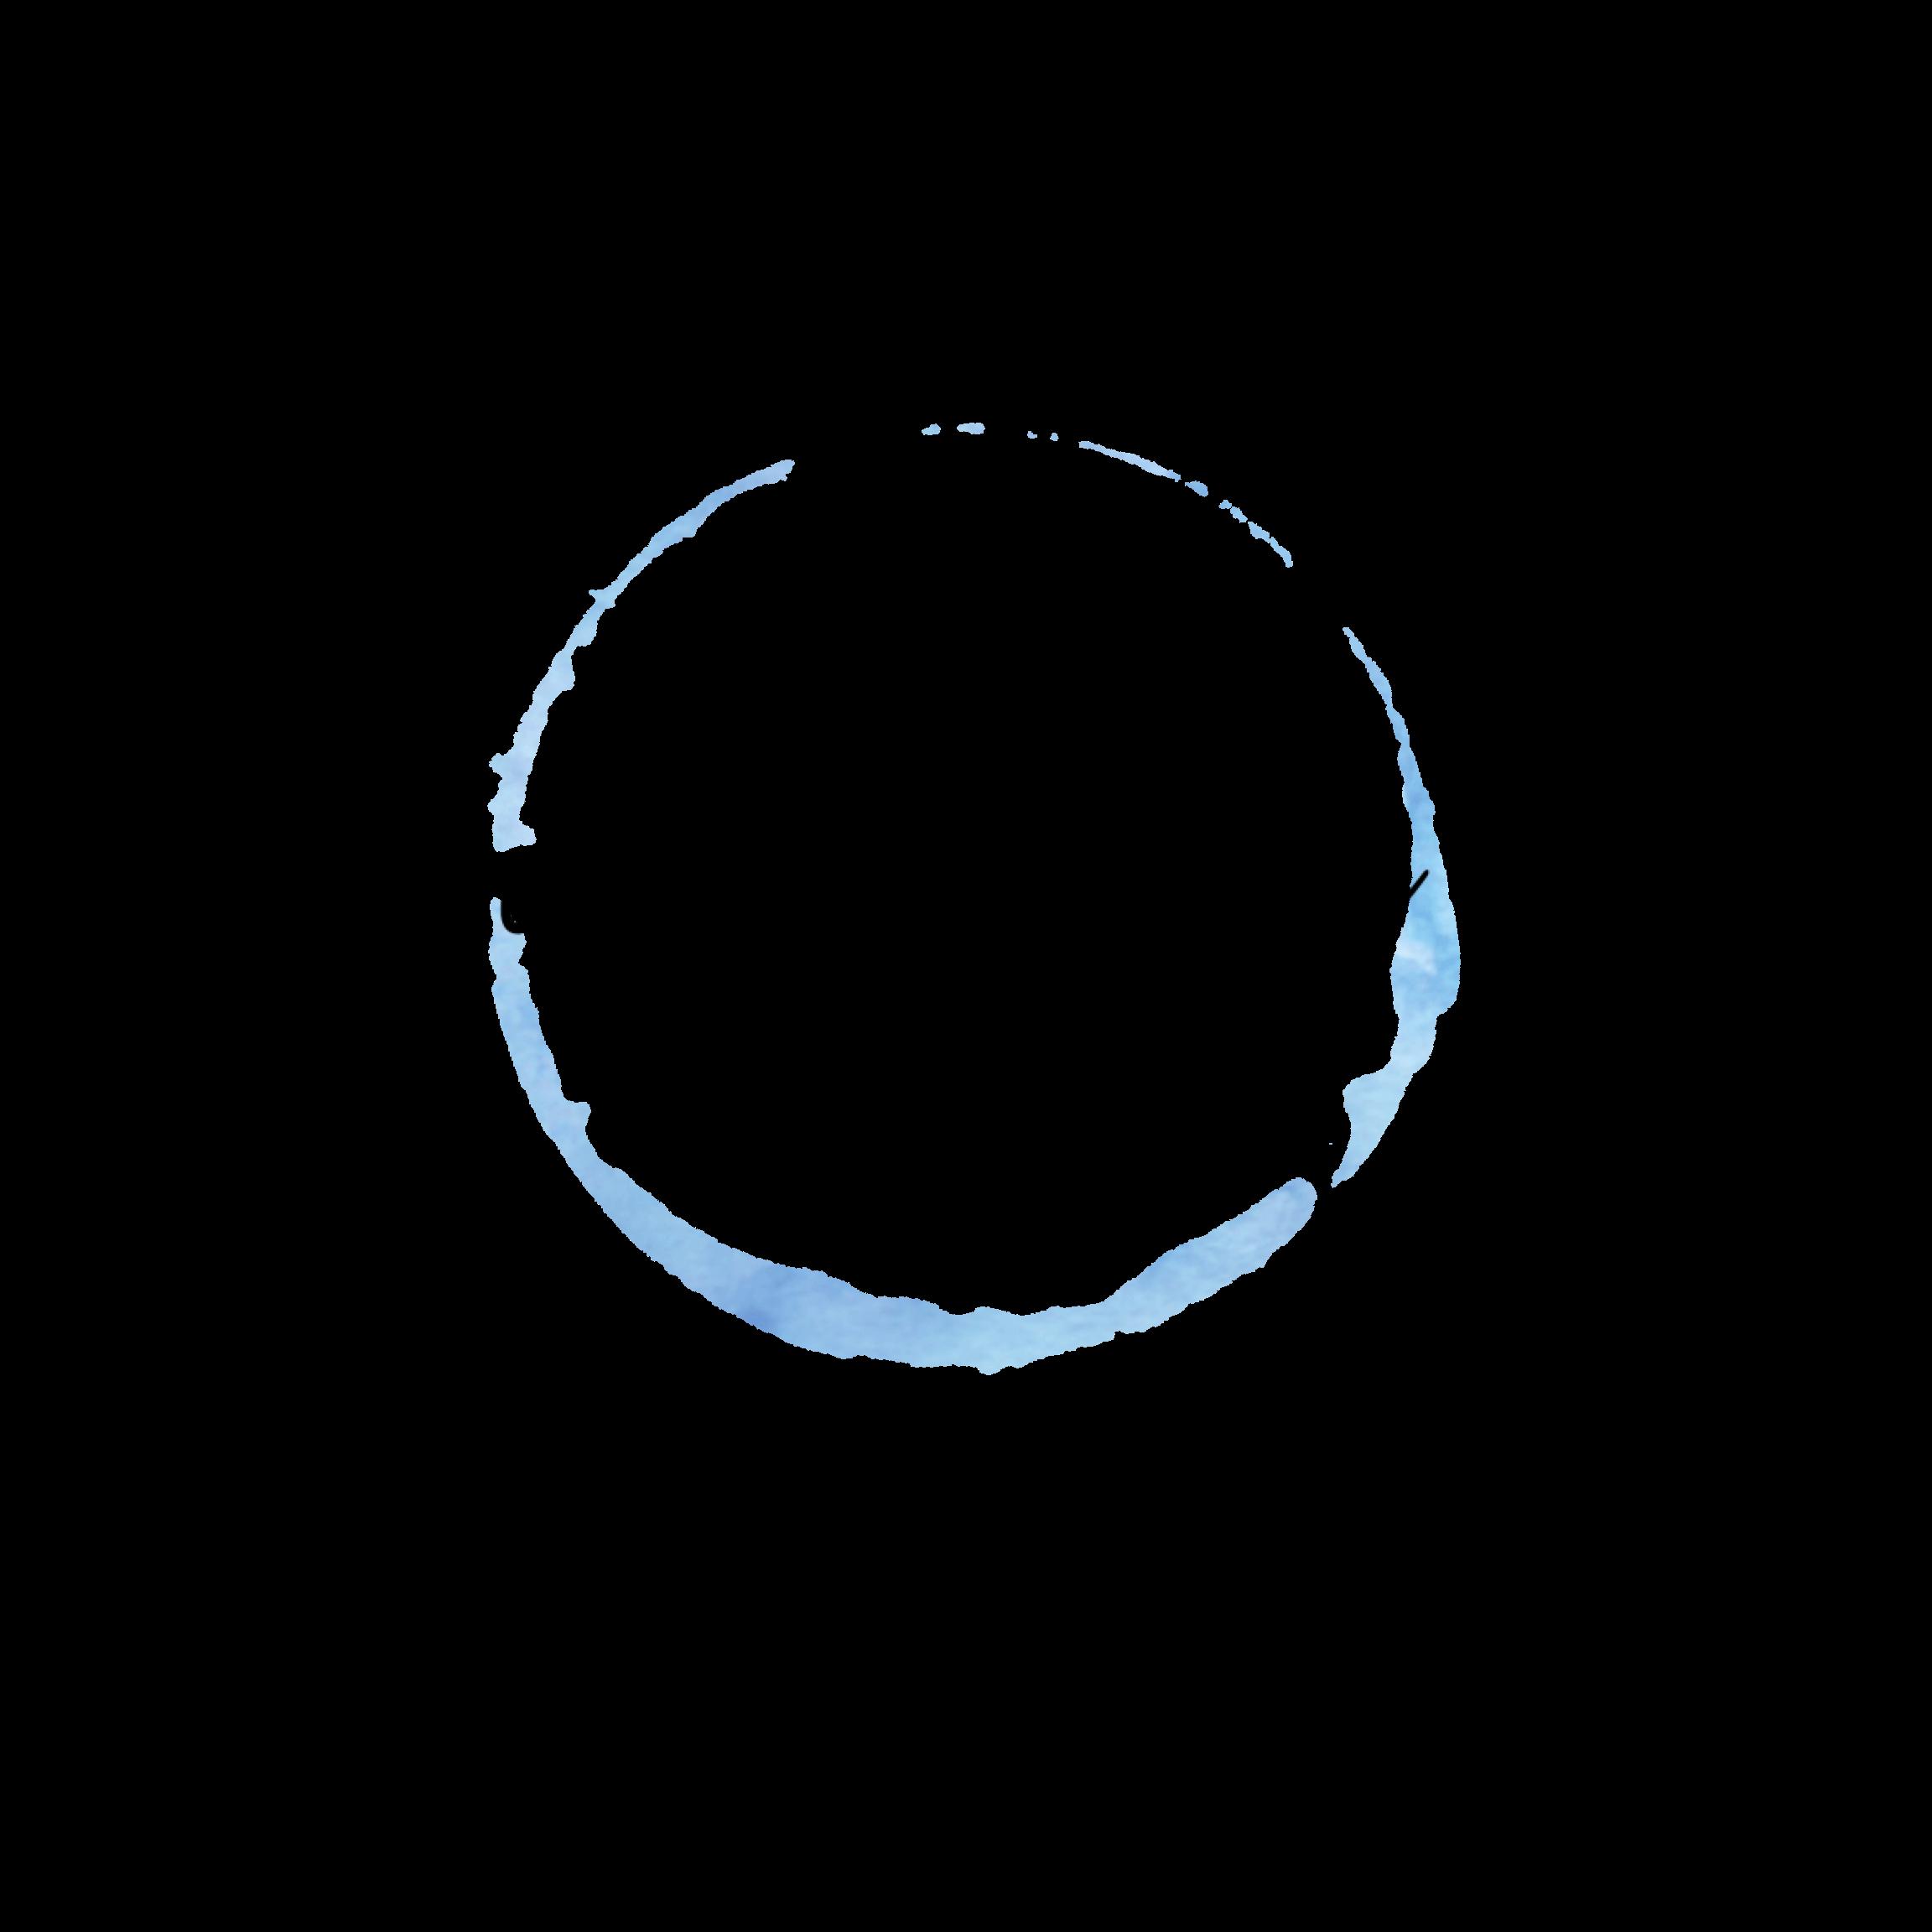 bl logo .PNG